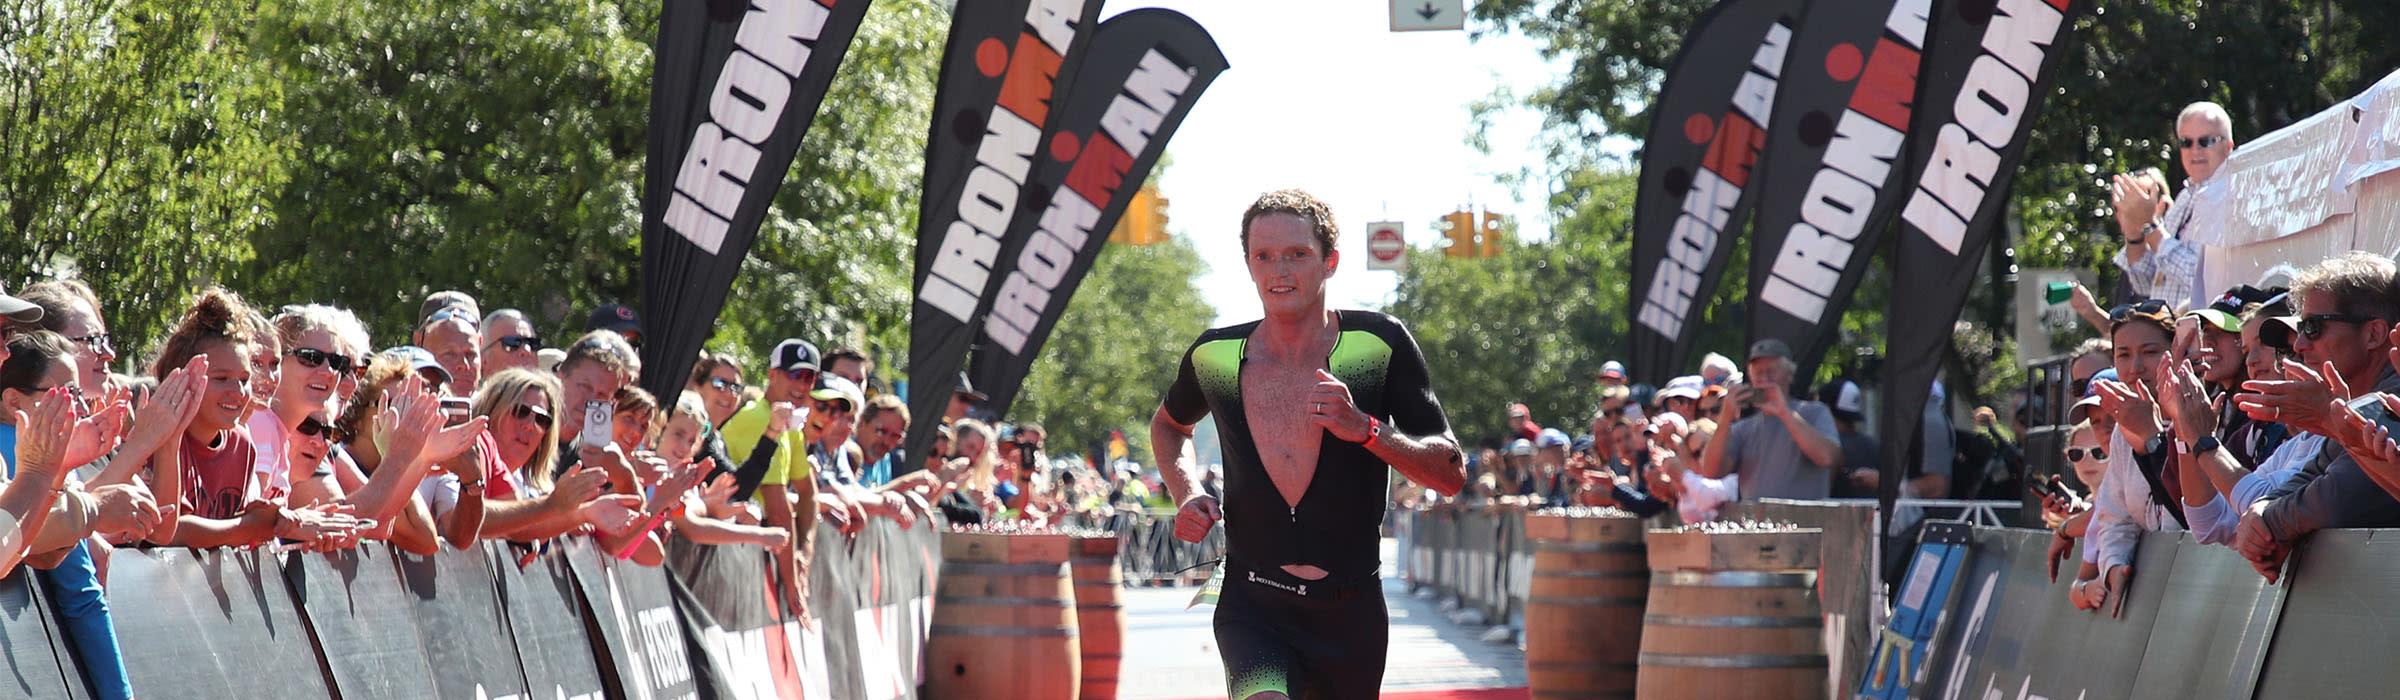 man running across finish line in Ironman race